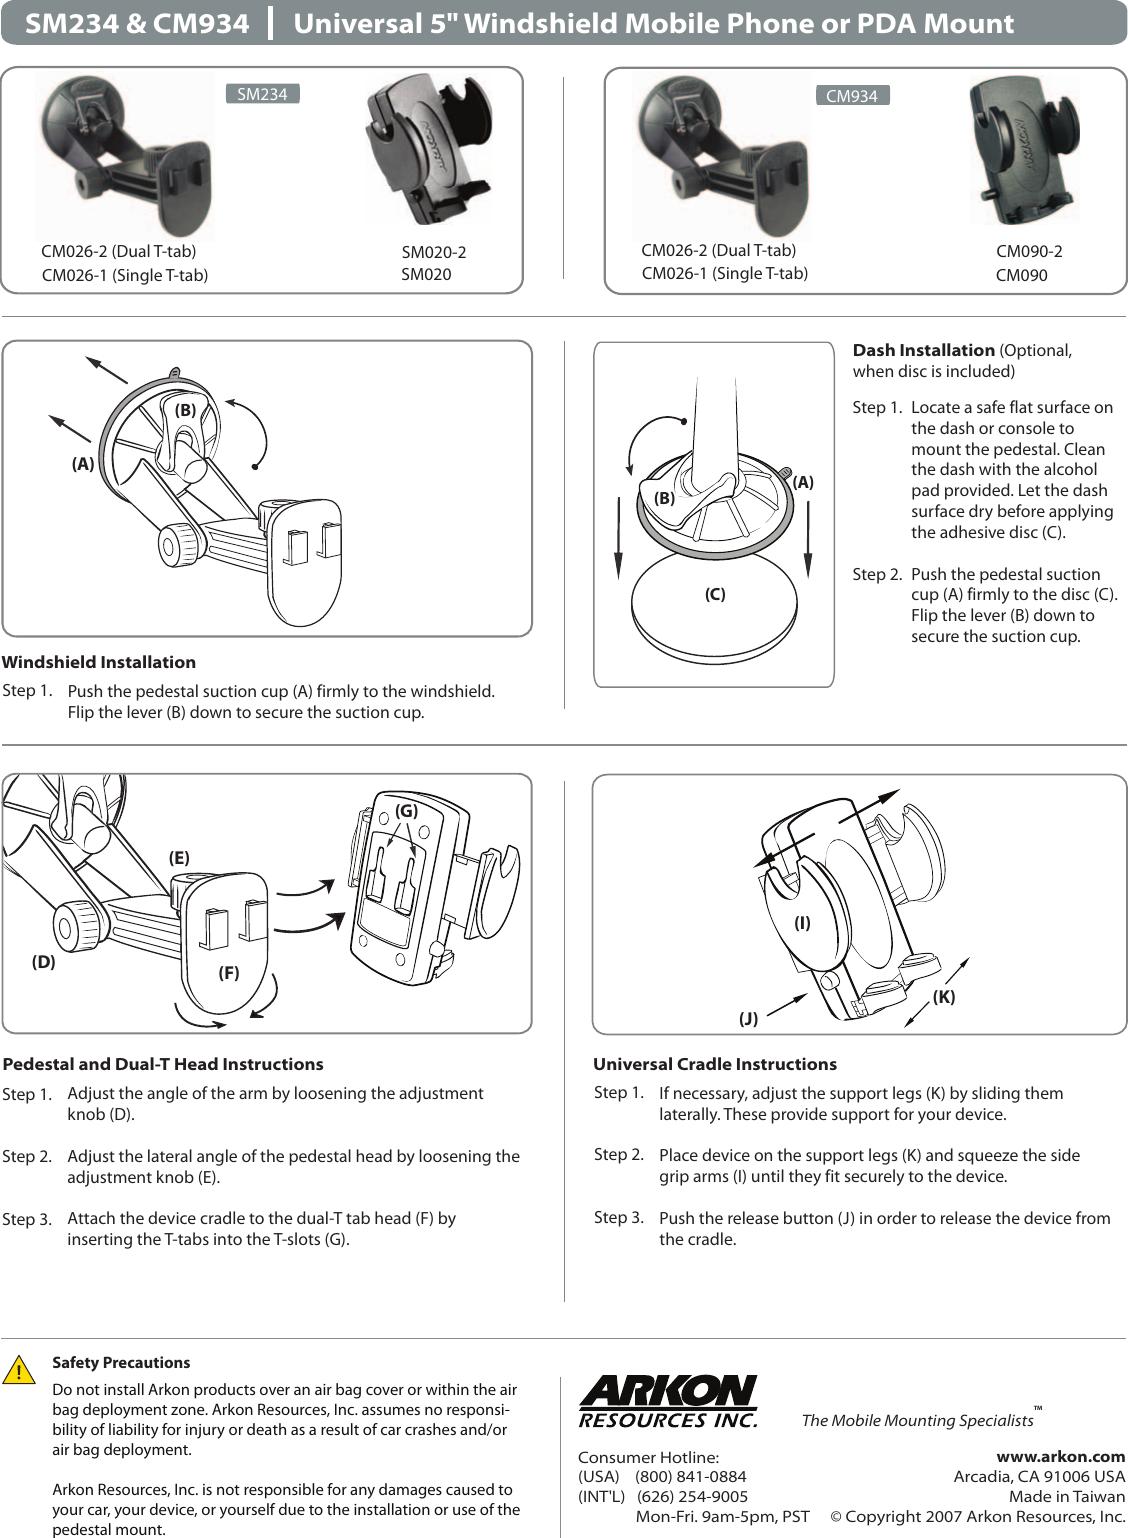 Arkon cm934 users manual pdf letter shell solutioingenieria Choice Image